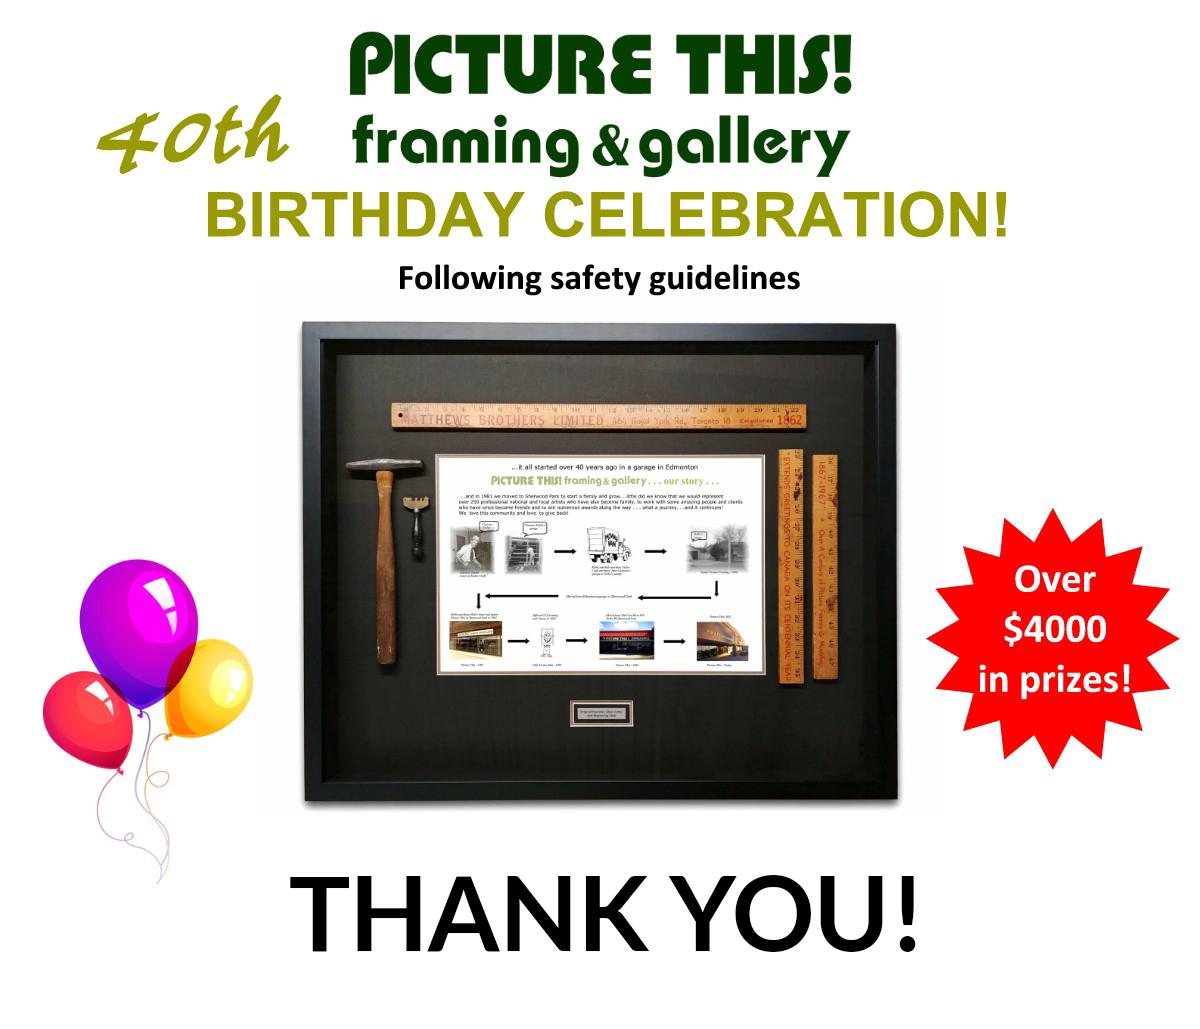 SP News Ad - 40th Birthday - Thank You